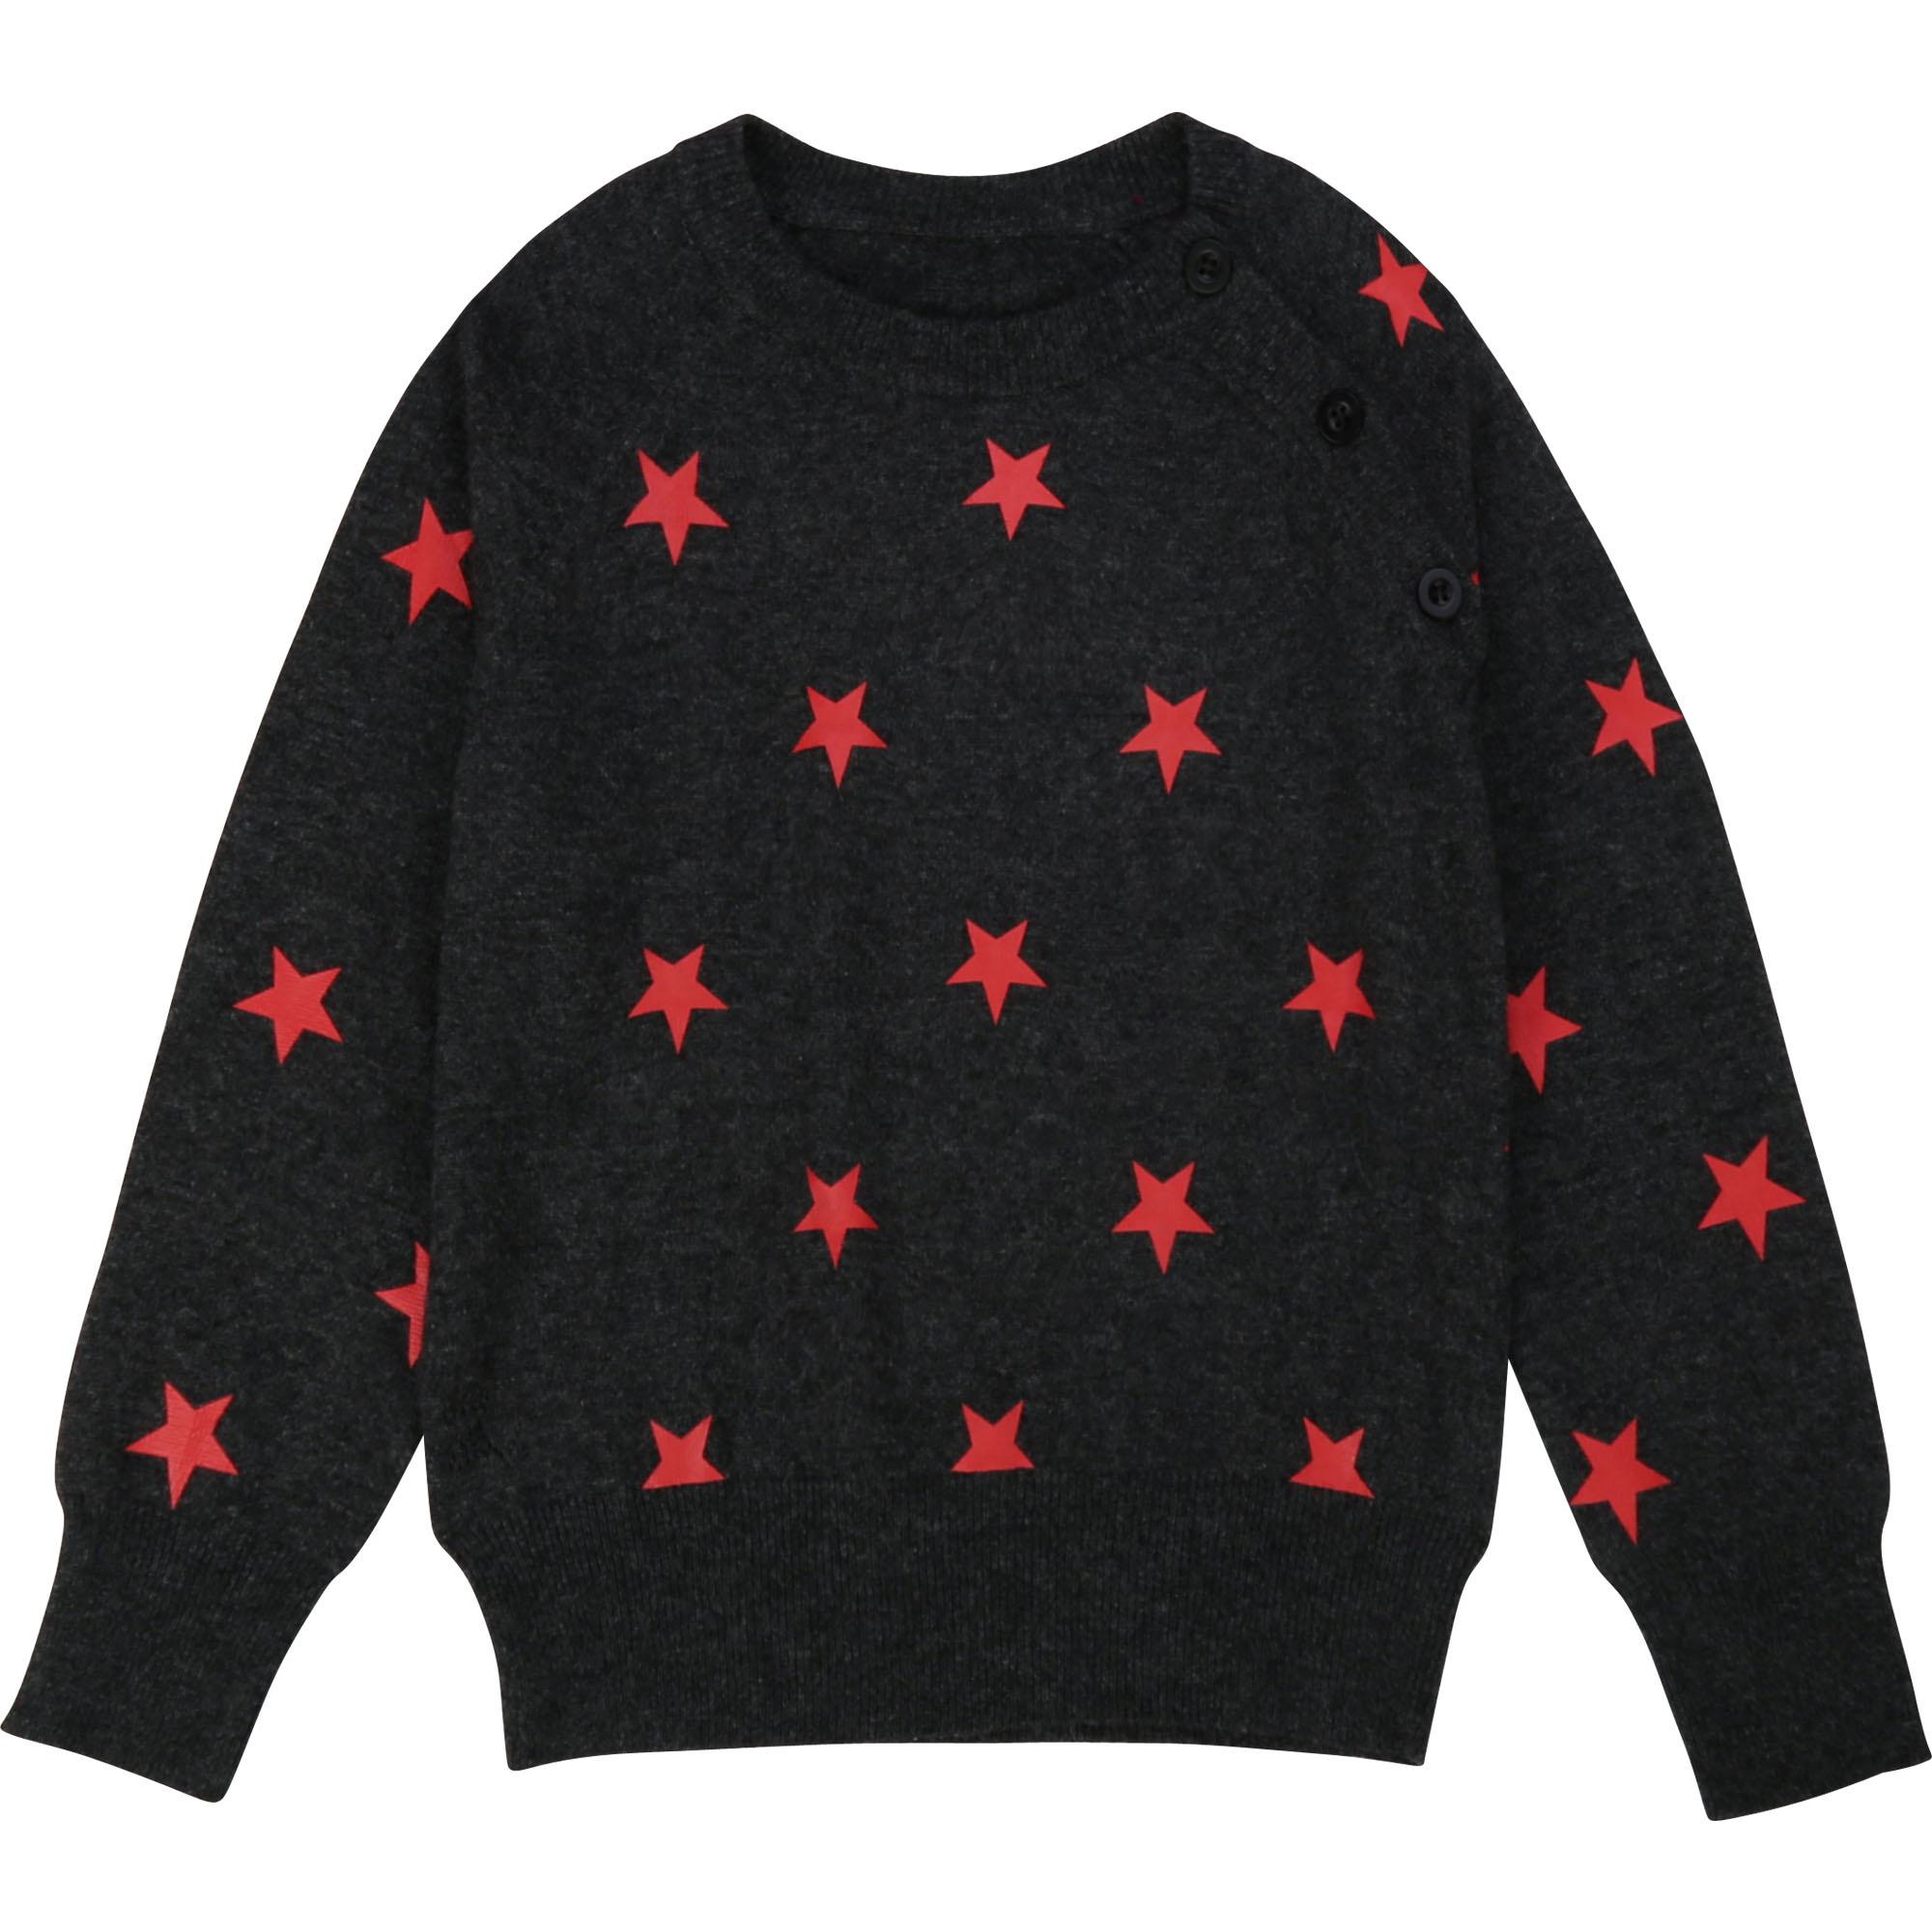 ZADIG & VOLTAIRE pull  en tricot imprimé-1